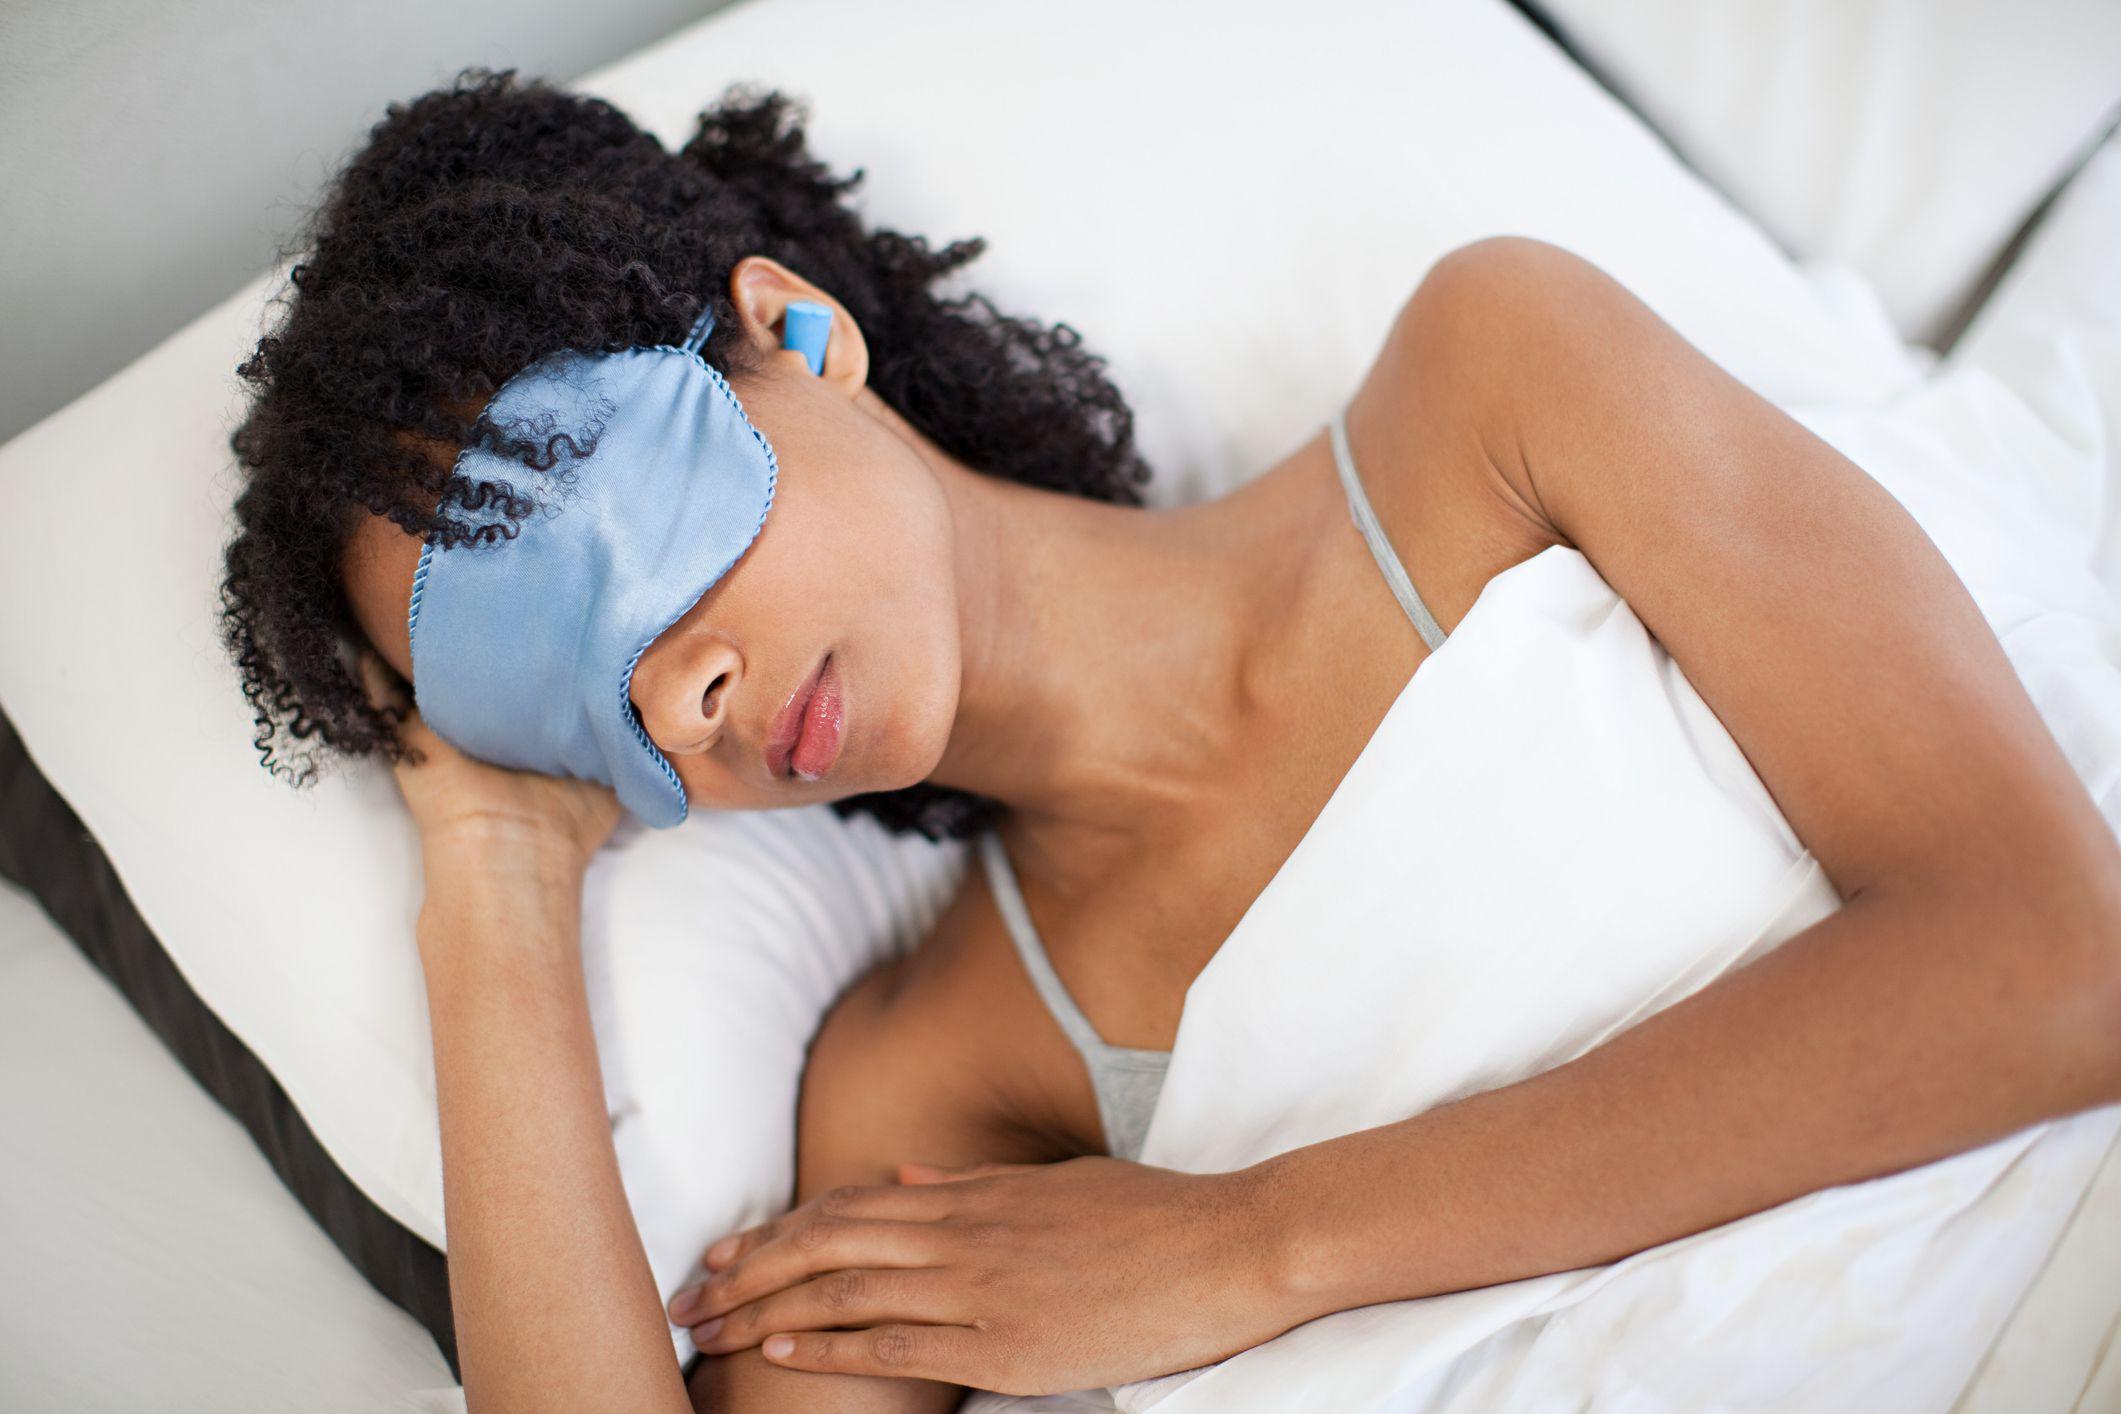 The 8 Best Earplugs to Buy for Sleeping in 2018